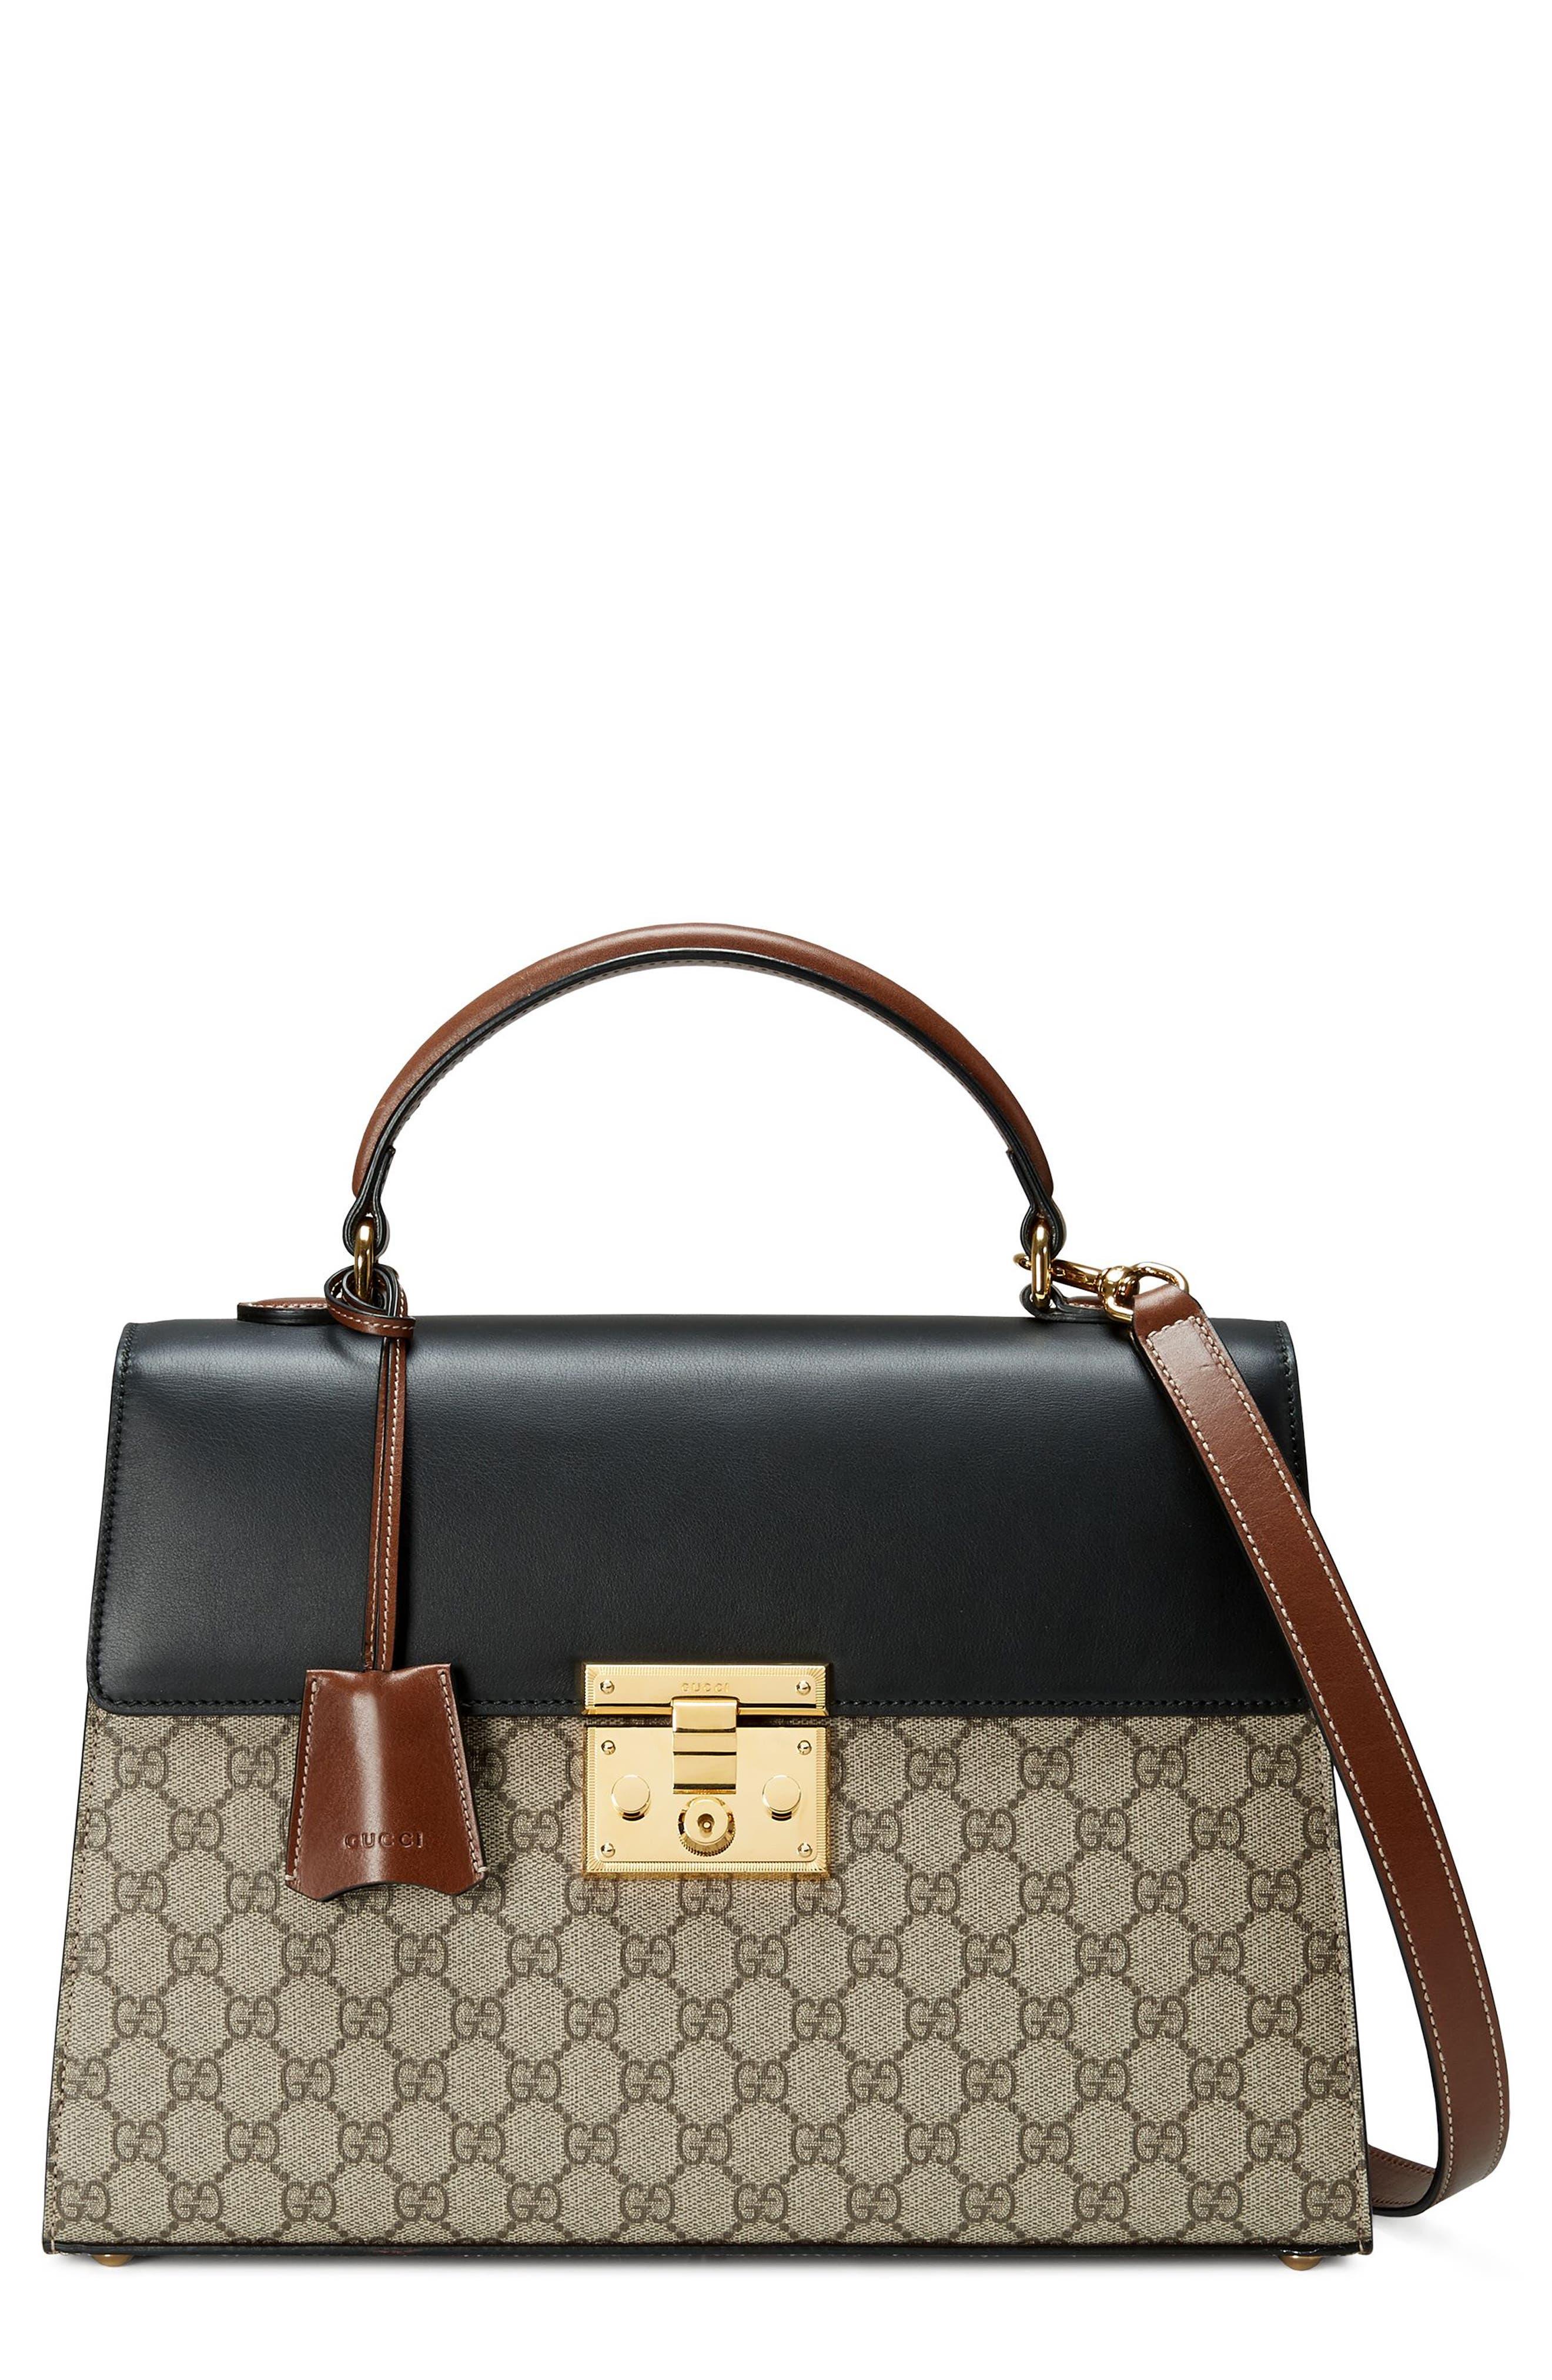 Medium Padlock Top Handle GG Supreme Canvas & Leather Bag,                             Main thumbnail 1, color,                             964